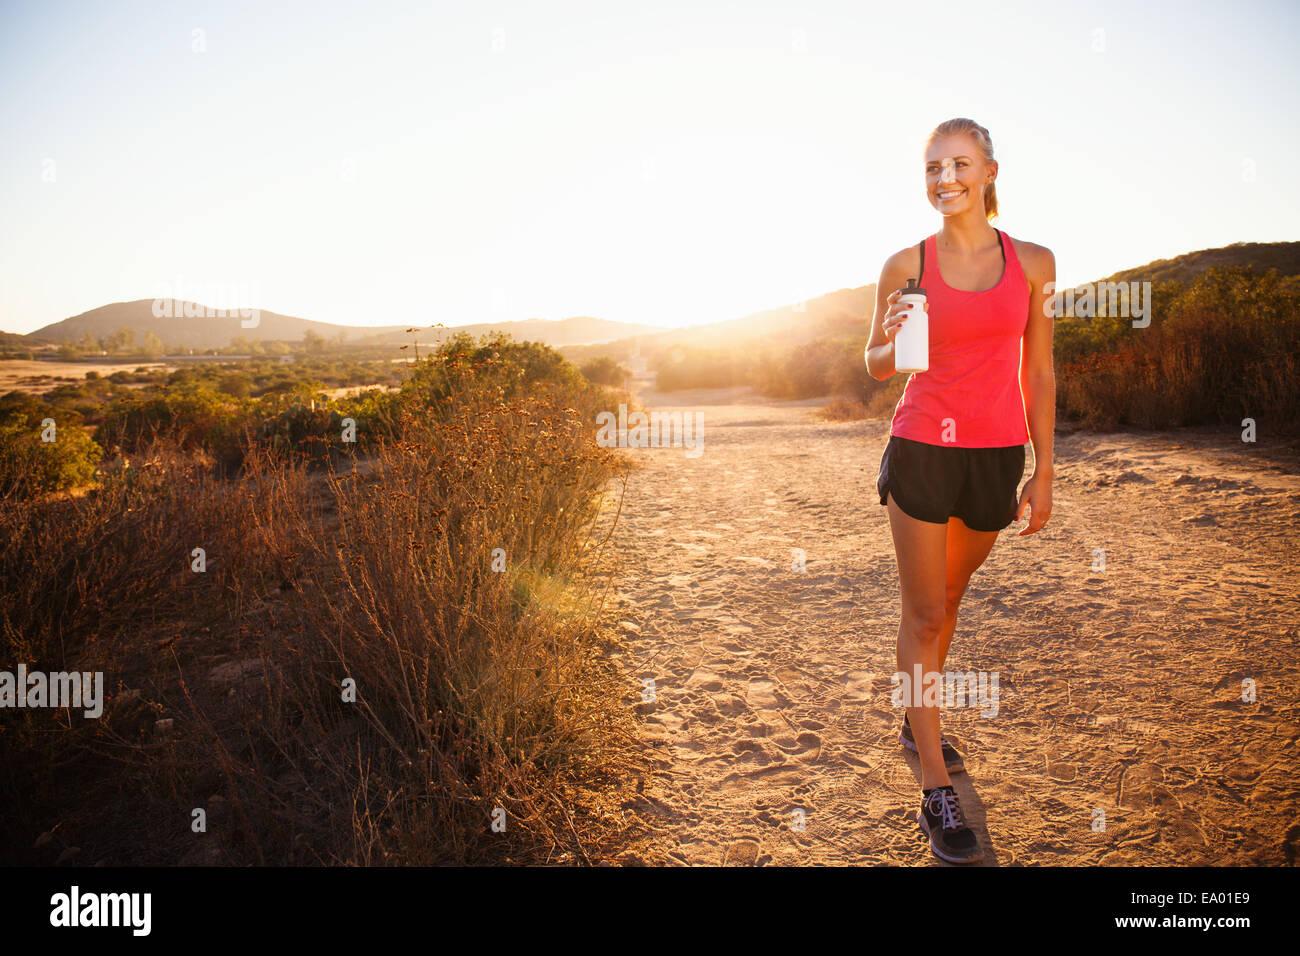 Female jogger holding water bottle on path, Poway, CA, USA - Stock Image